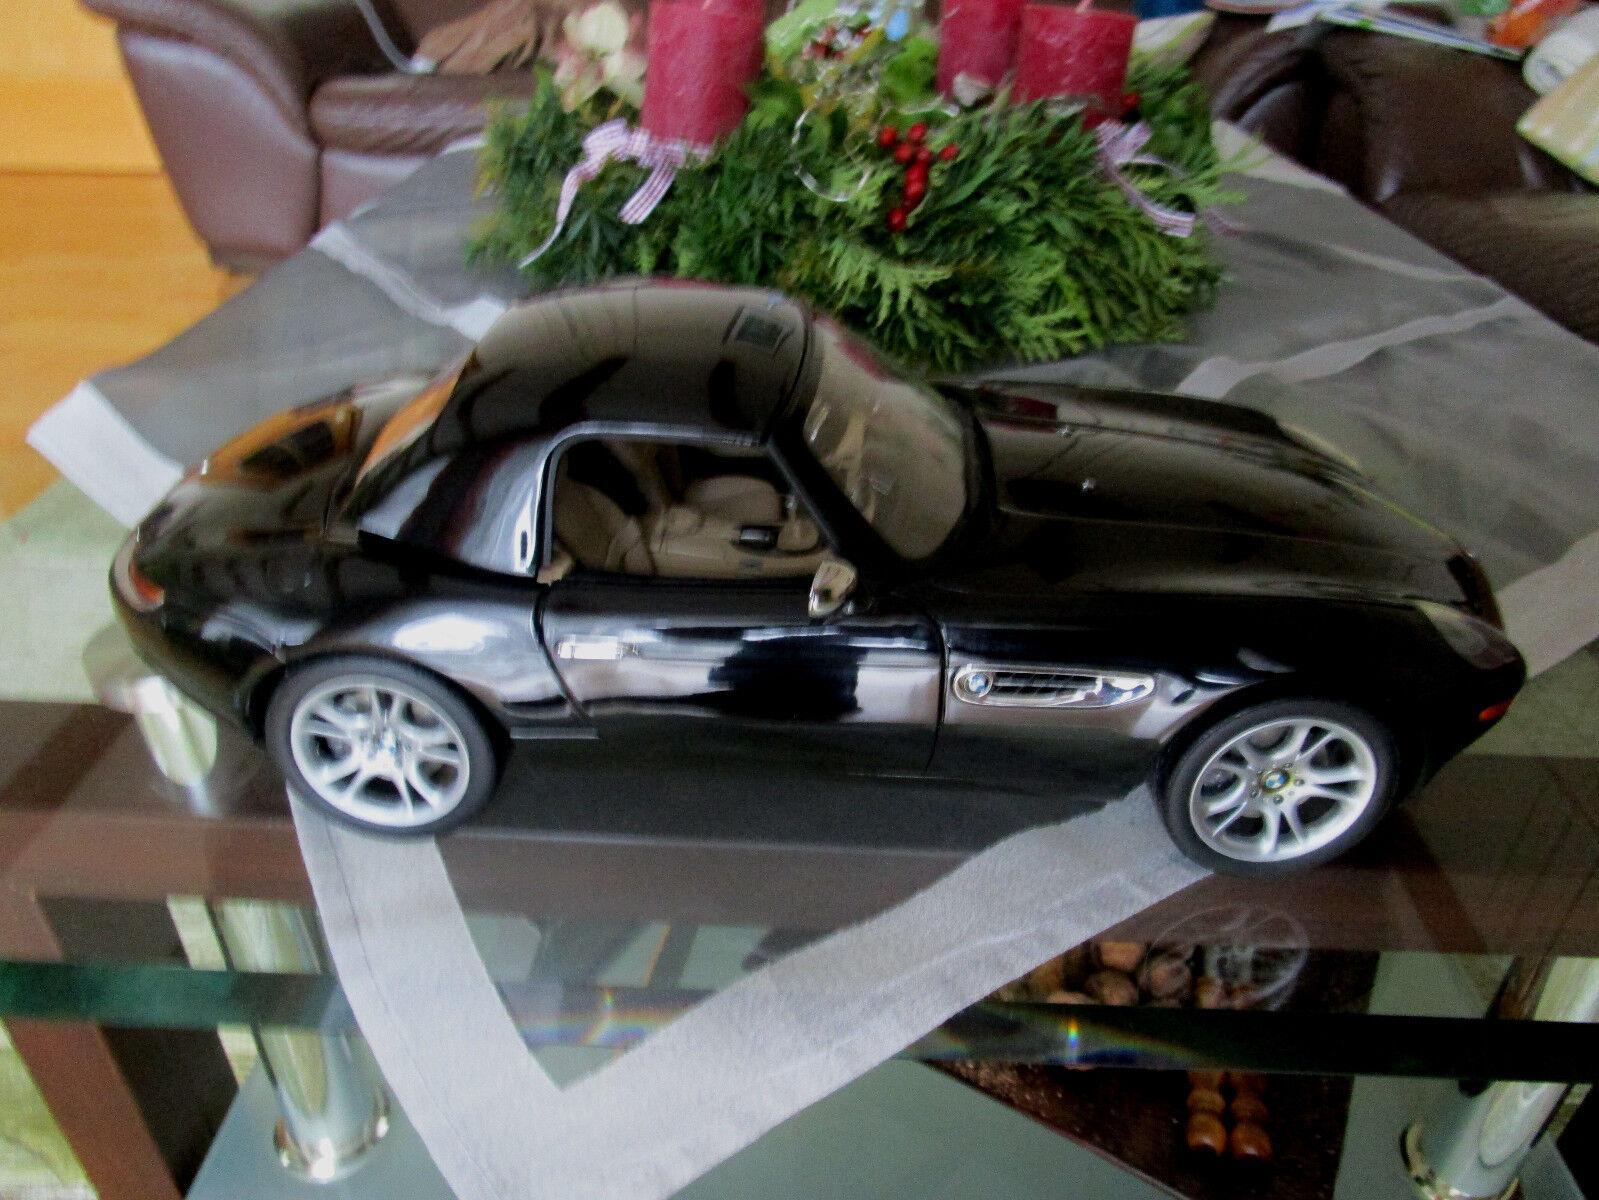 BMW z8 1 12 Kyosho Noir, Cuir Veritable Beige Neuf dans sa boîte NEUF